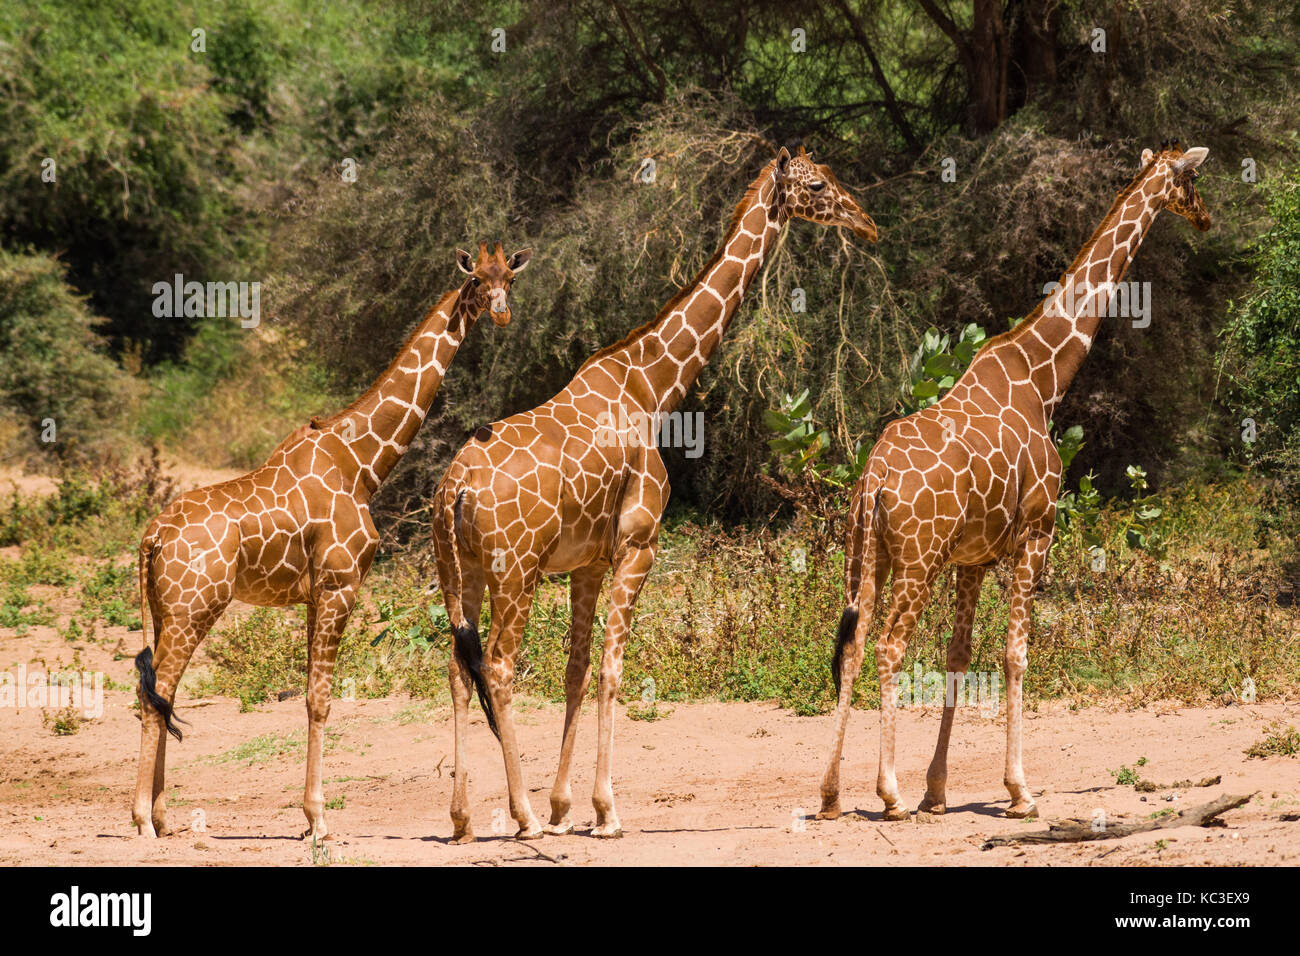 Giraffe réticulée (Giraffa camelopardalis reticulata), Samburu Jeu National Park Reserve, Kenya, Afrique de l'Est Banque D'Images